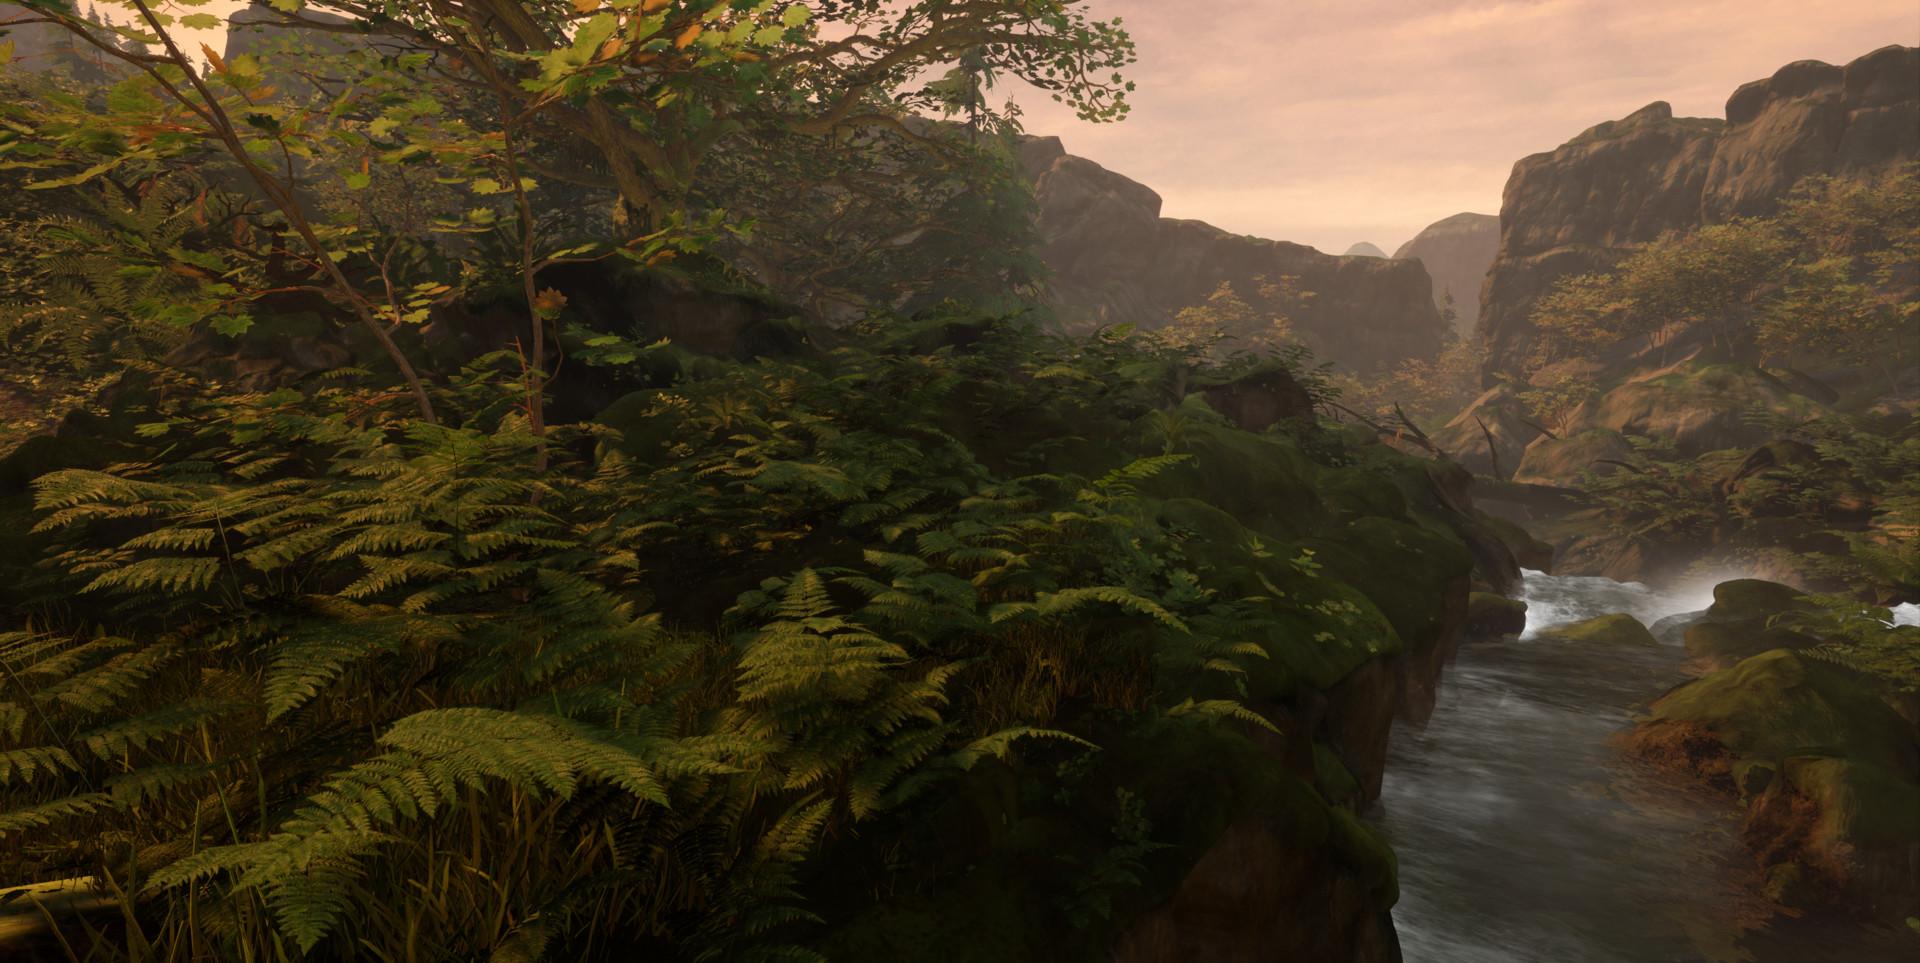 Alina godfrey enchanted falls ferns